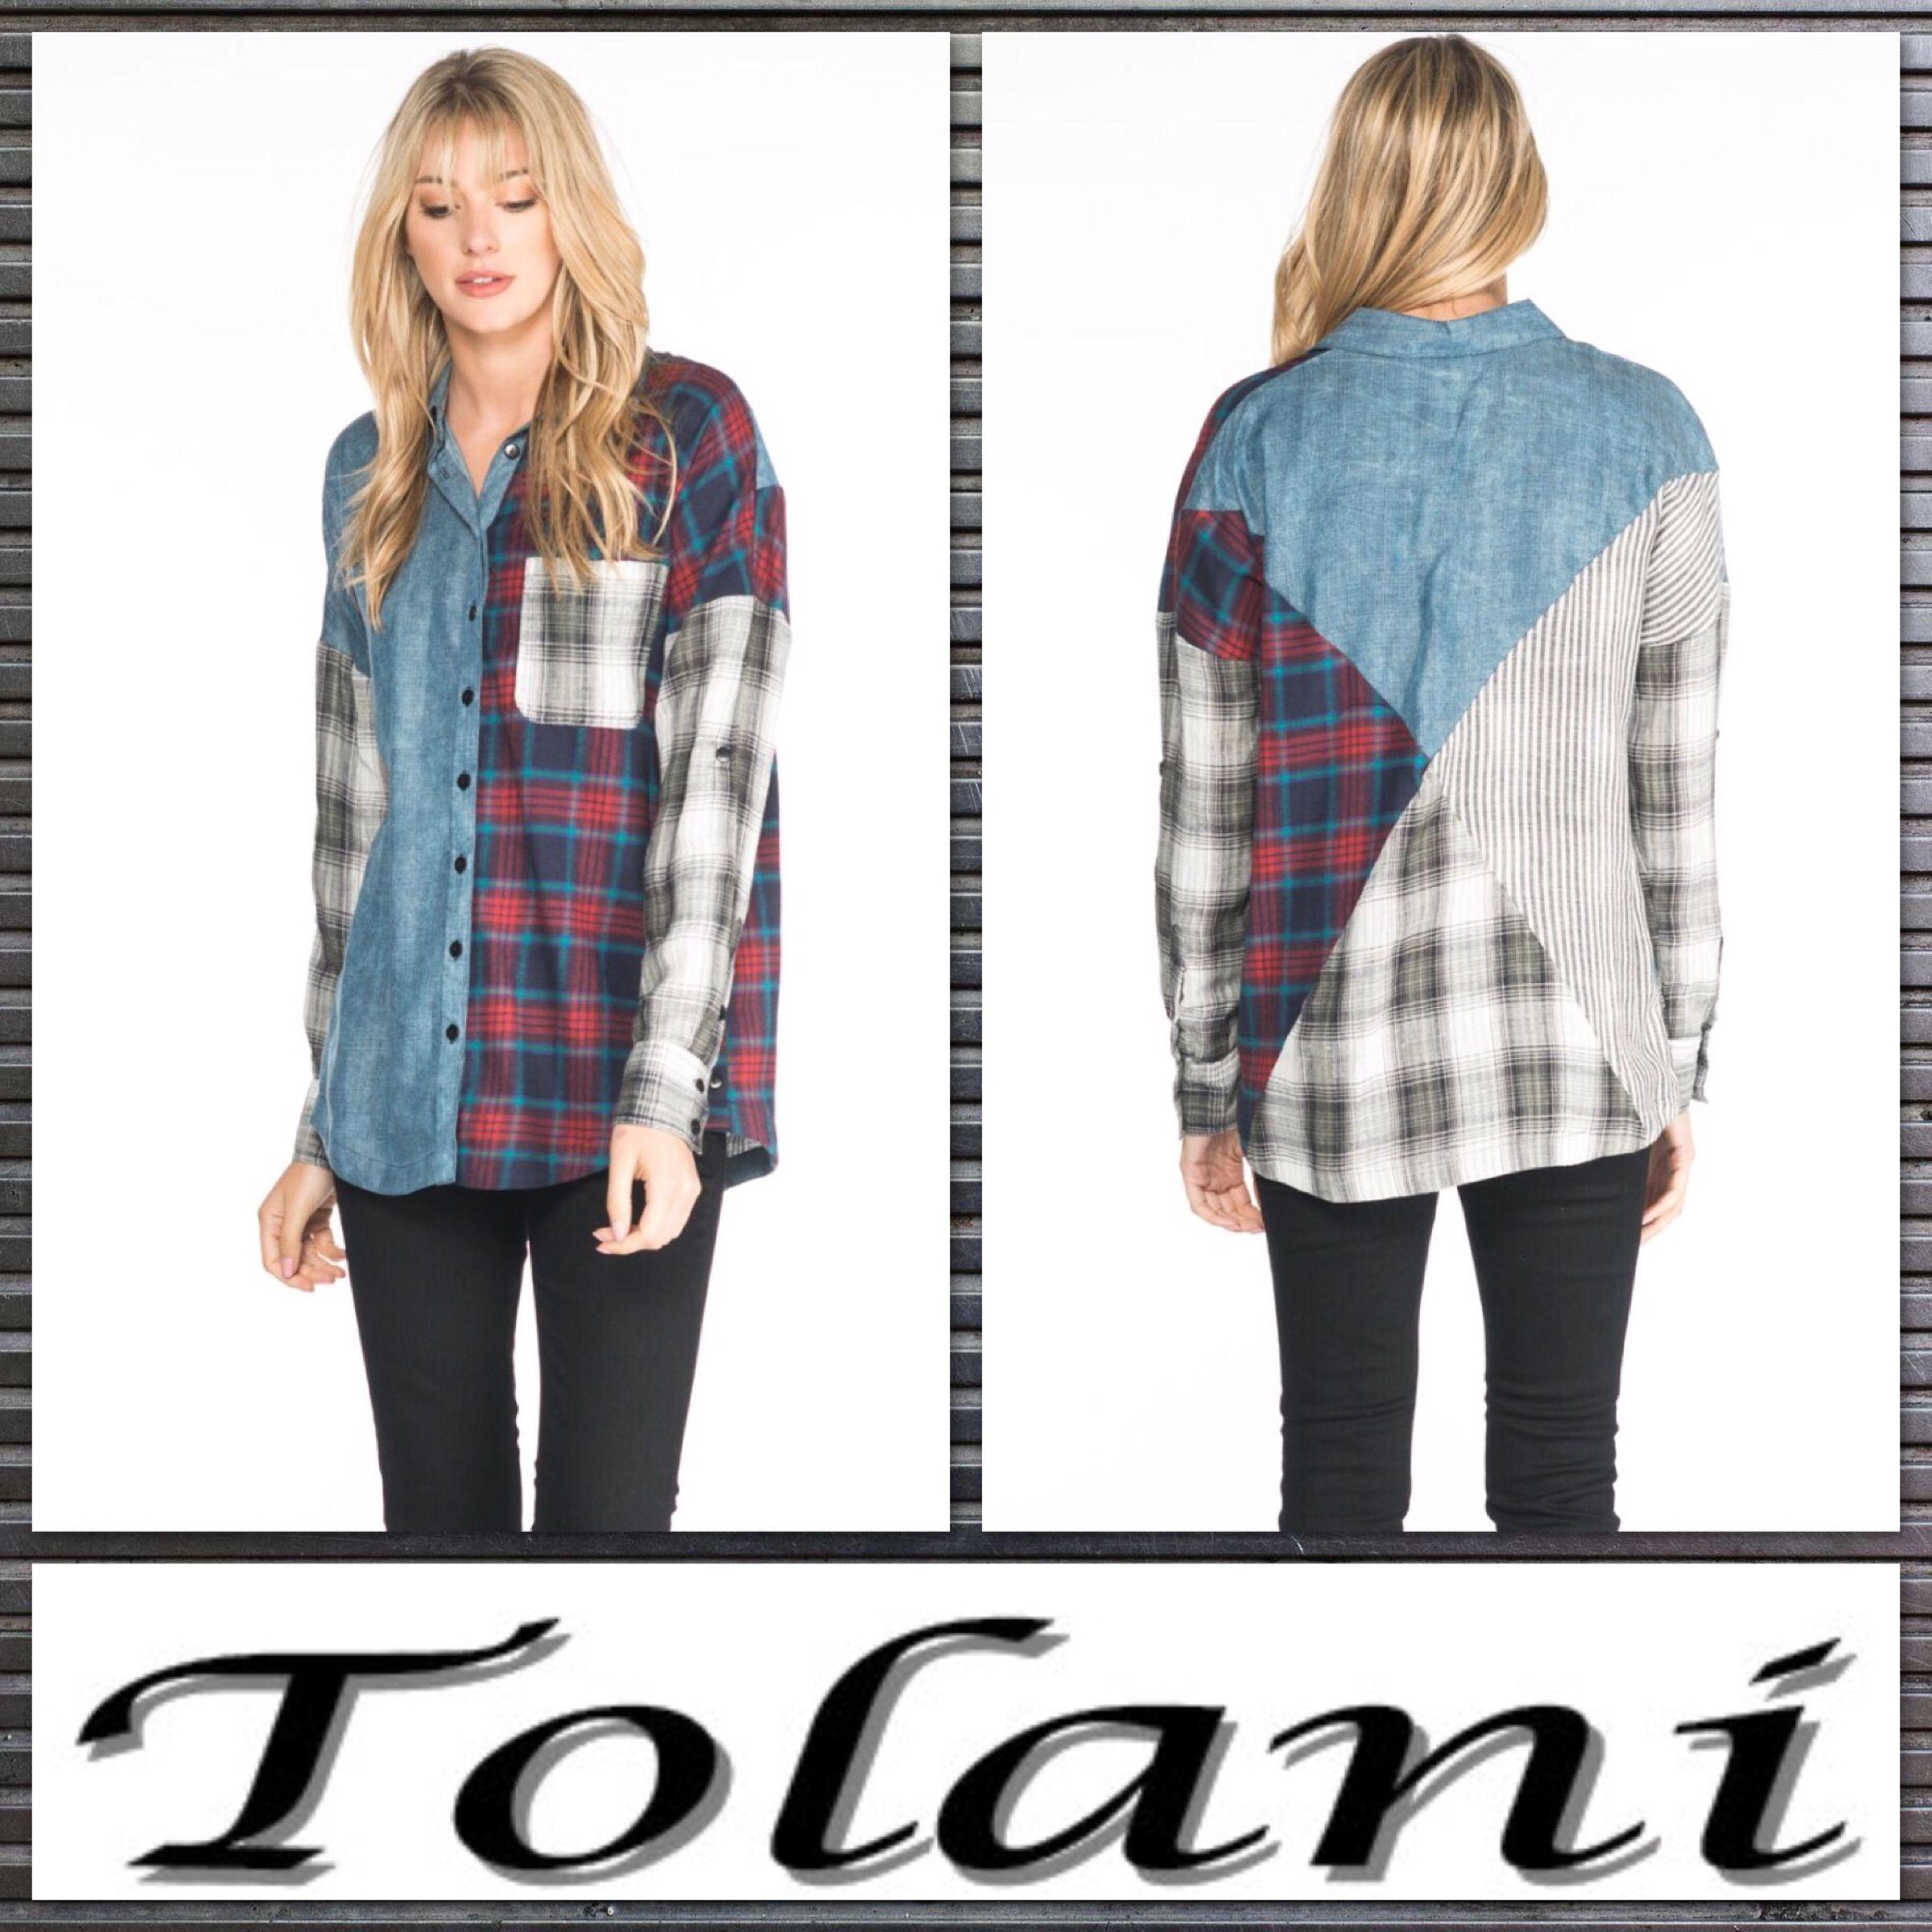 c905006779683c Patchwork Perfect! We Love this new big shirt.  Tolani  madeinindia  Save30%